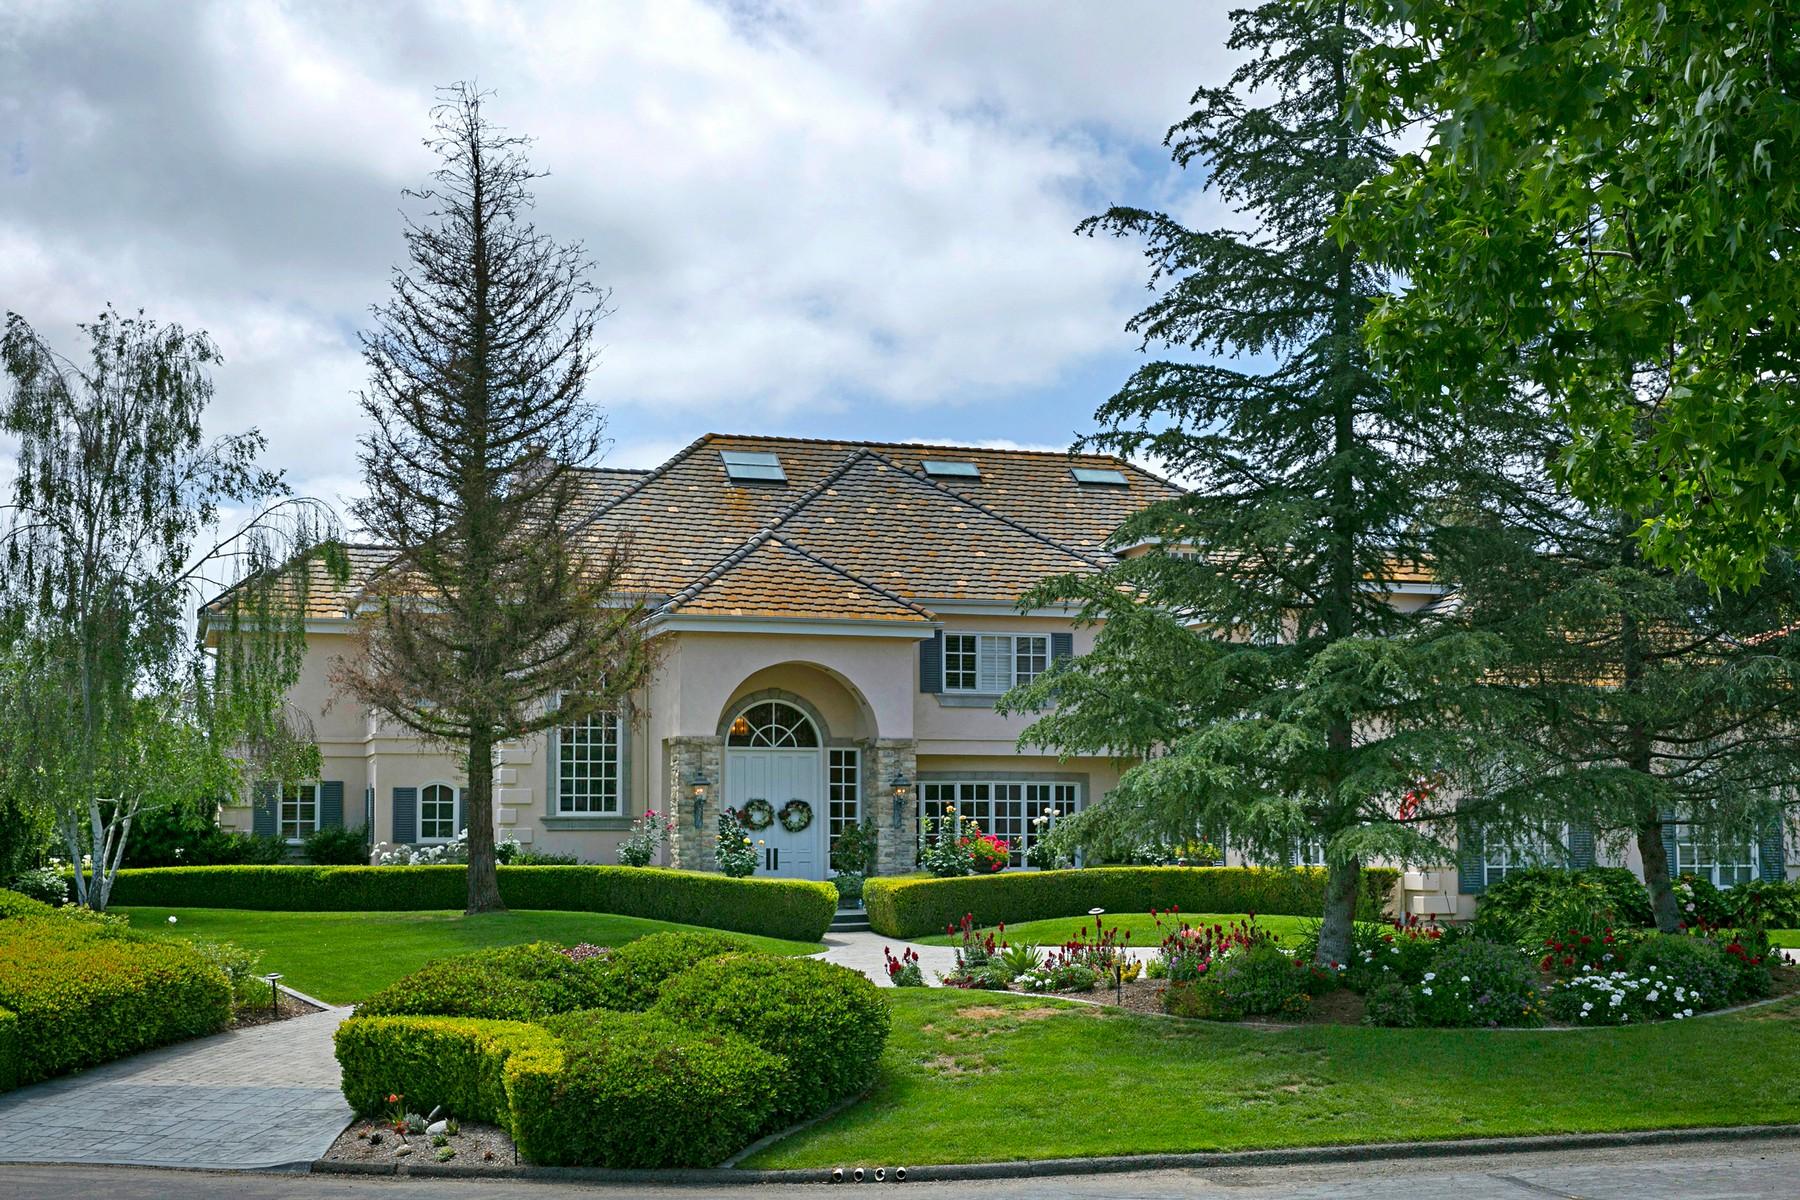 Single Family Home for Sale at 6275 Camino Del Pajaro Rancho Santa Fe, California, 92067 United States